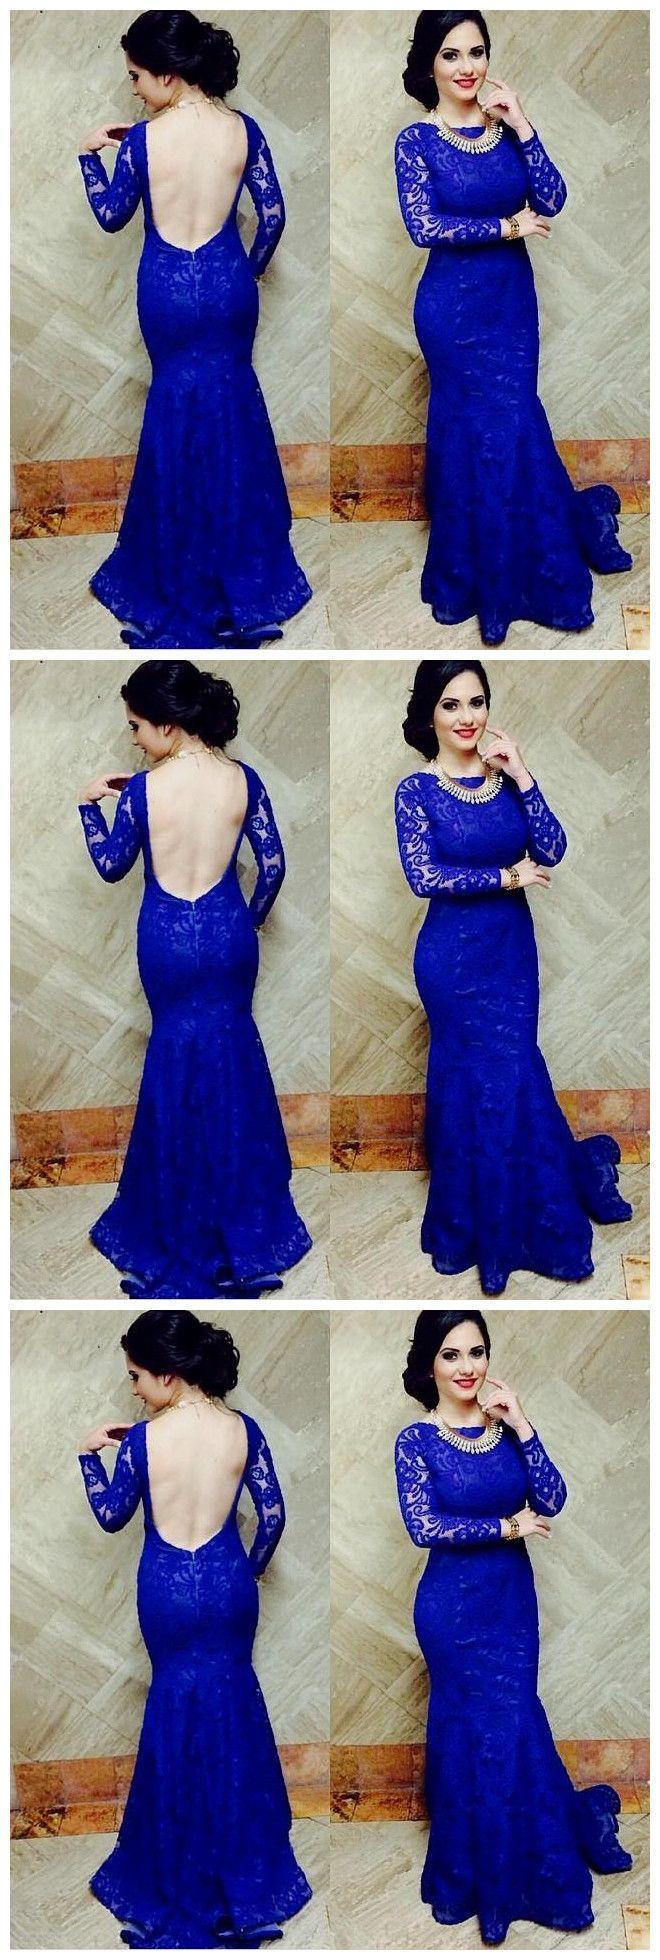 Long sleeve prom dresslace prom dressesevening dress evening